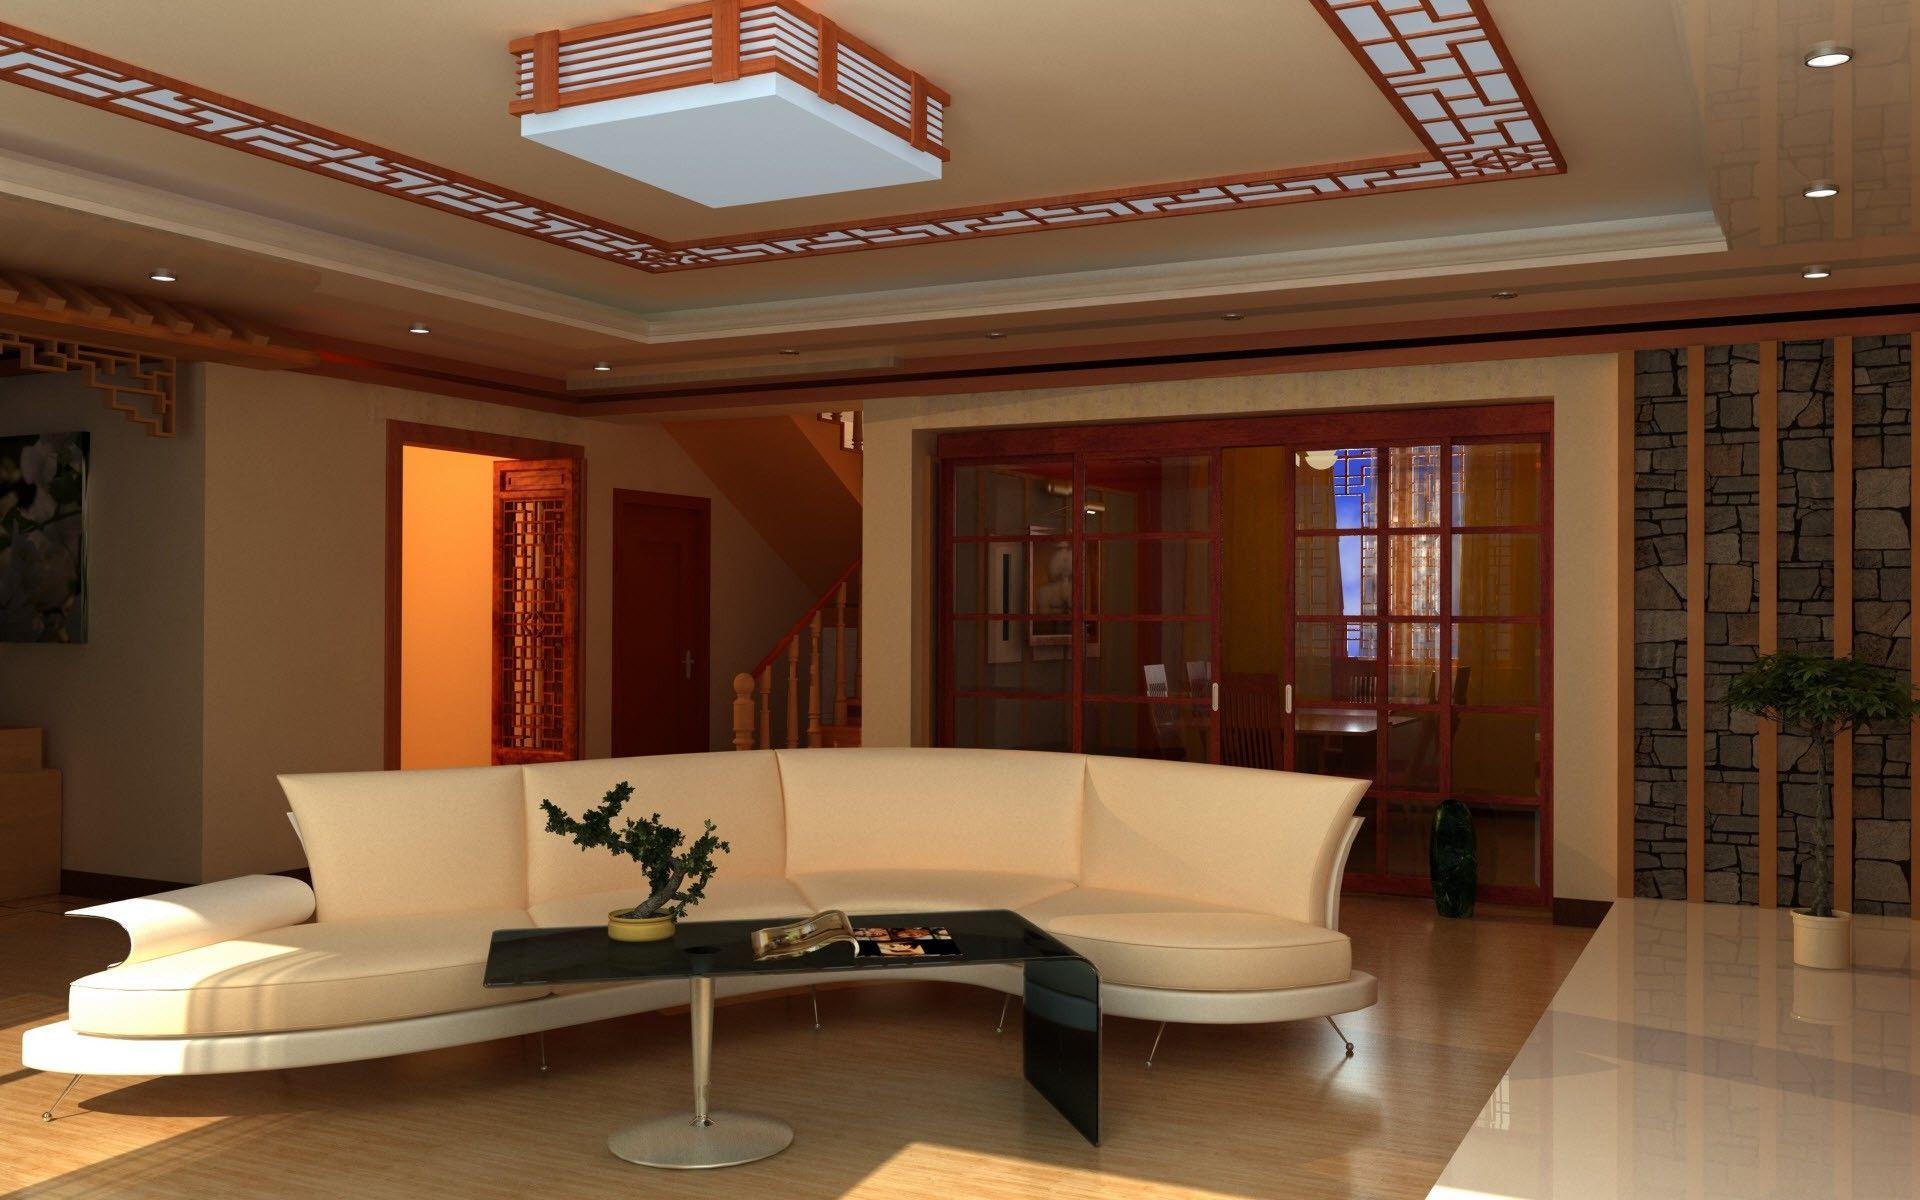 Resultado De Imagen Para Salas Elegantes  Project 1 Int Captivating Best Living Room Designs In India 2018